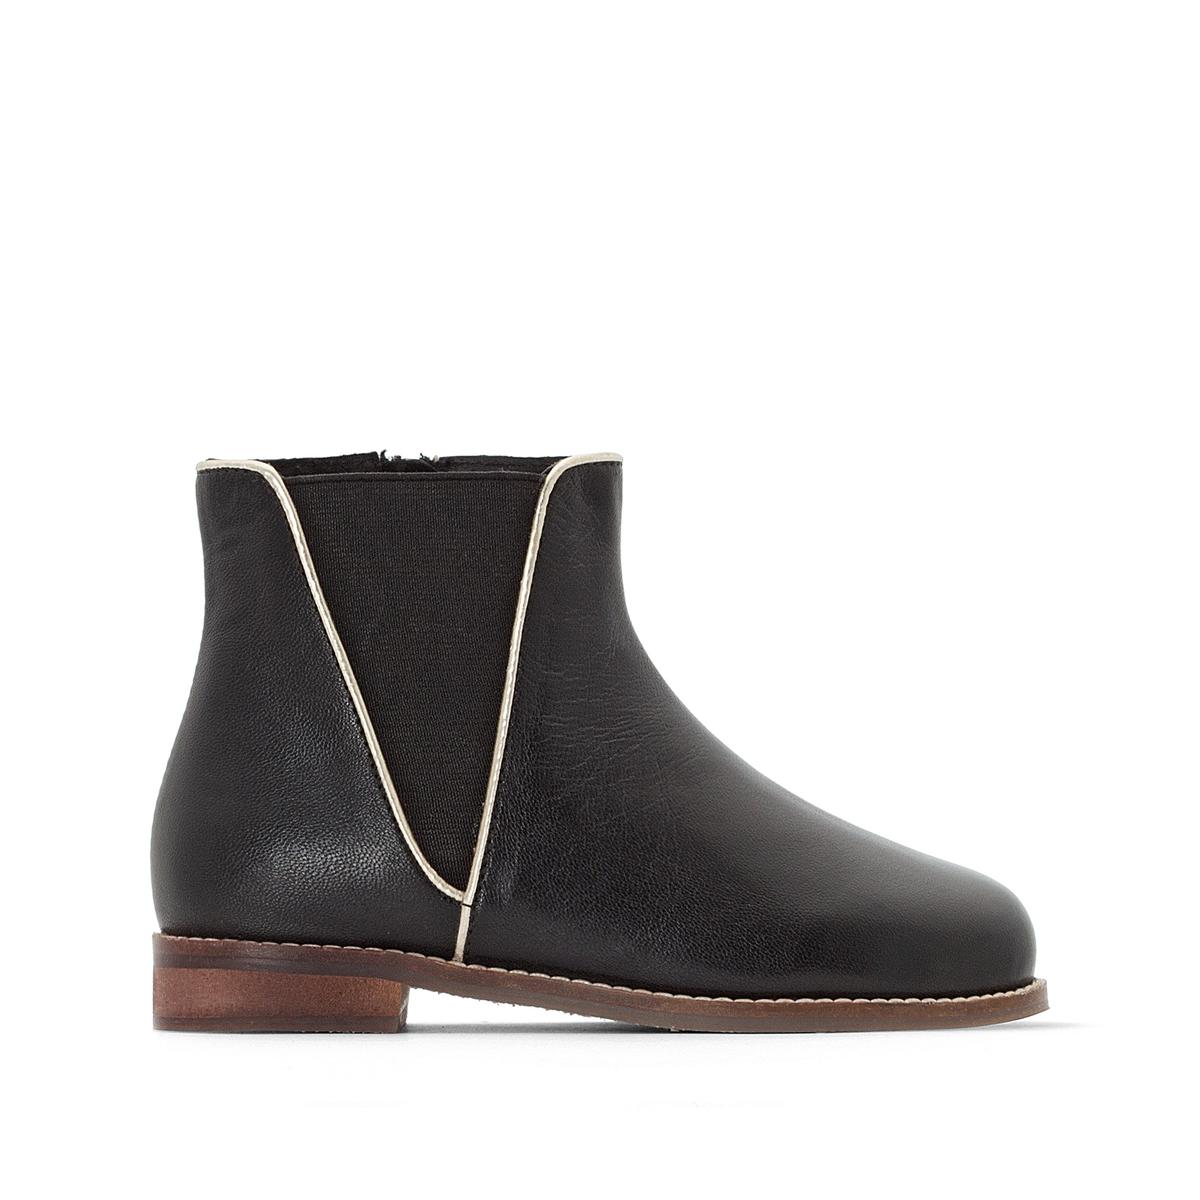 Boots chelsea iridescente 26-39